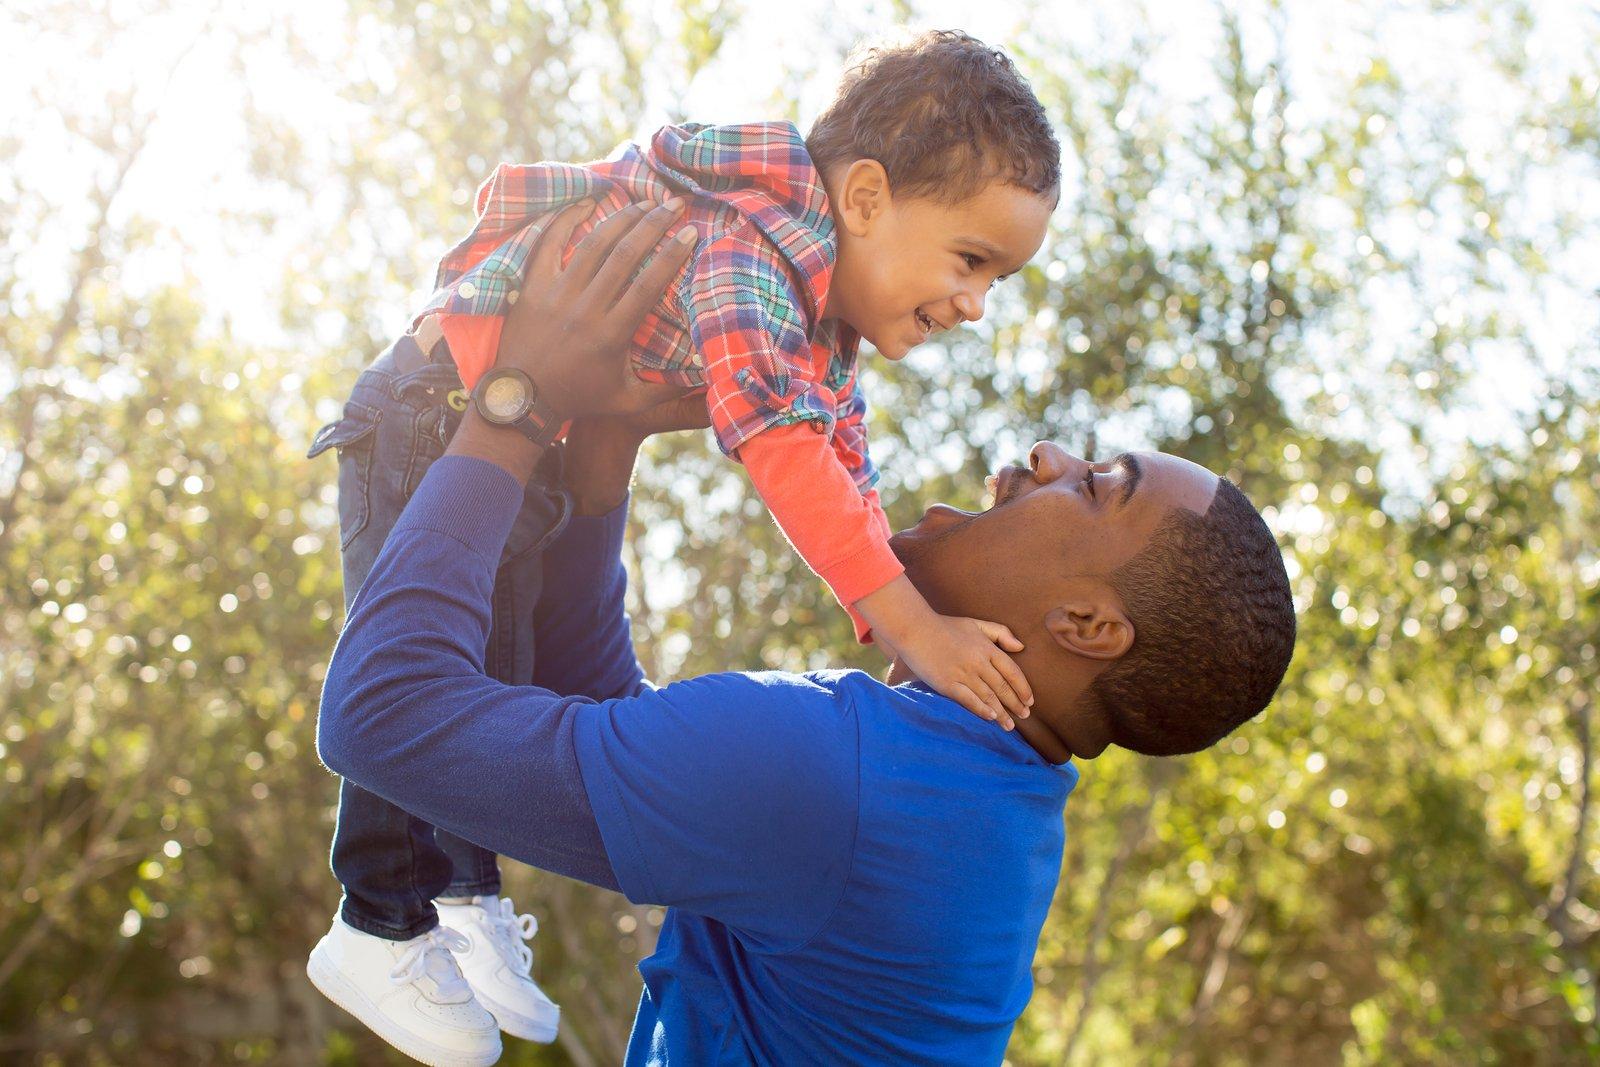 Frases Para O Dia Dos Pais. Comemore Esta Data Especial